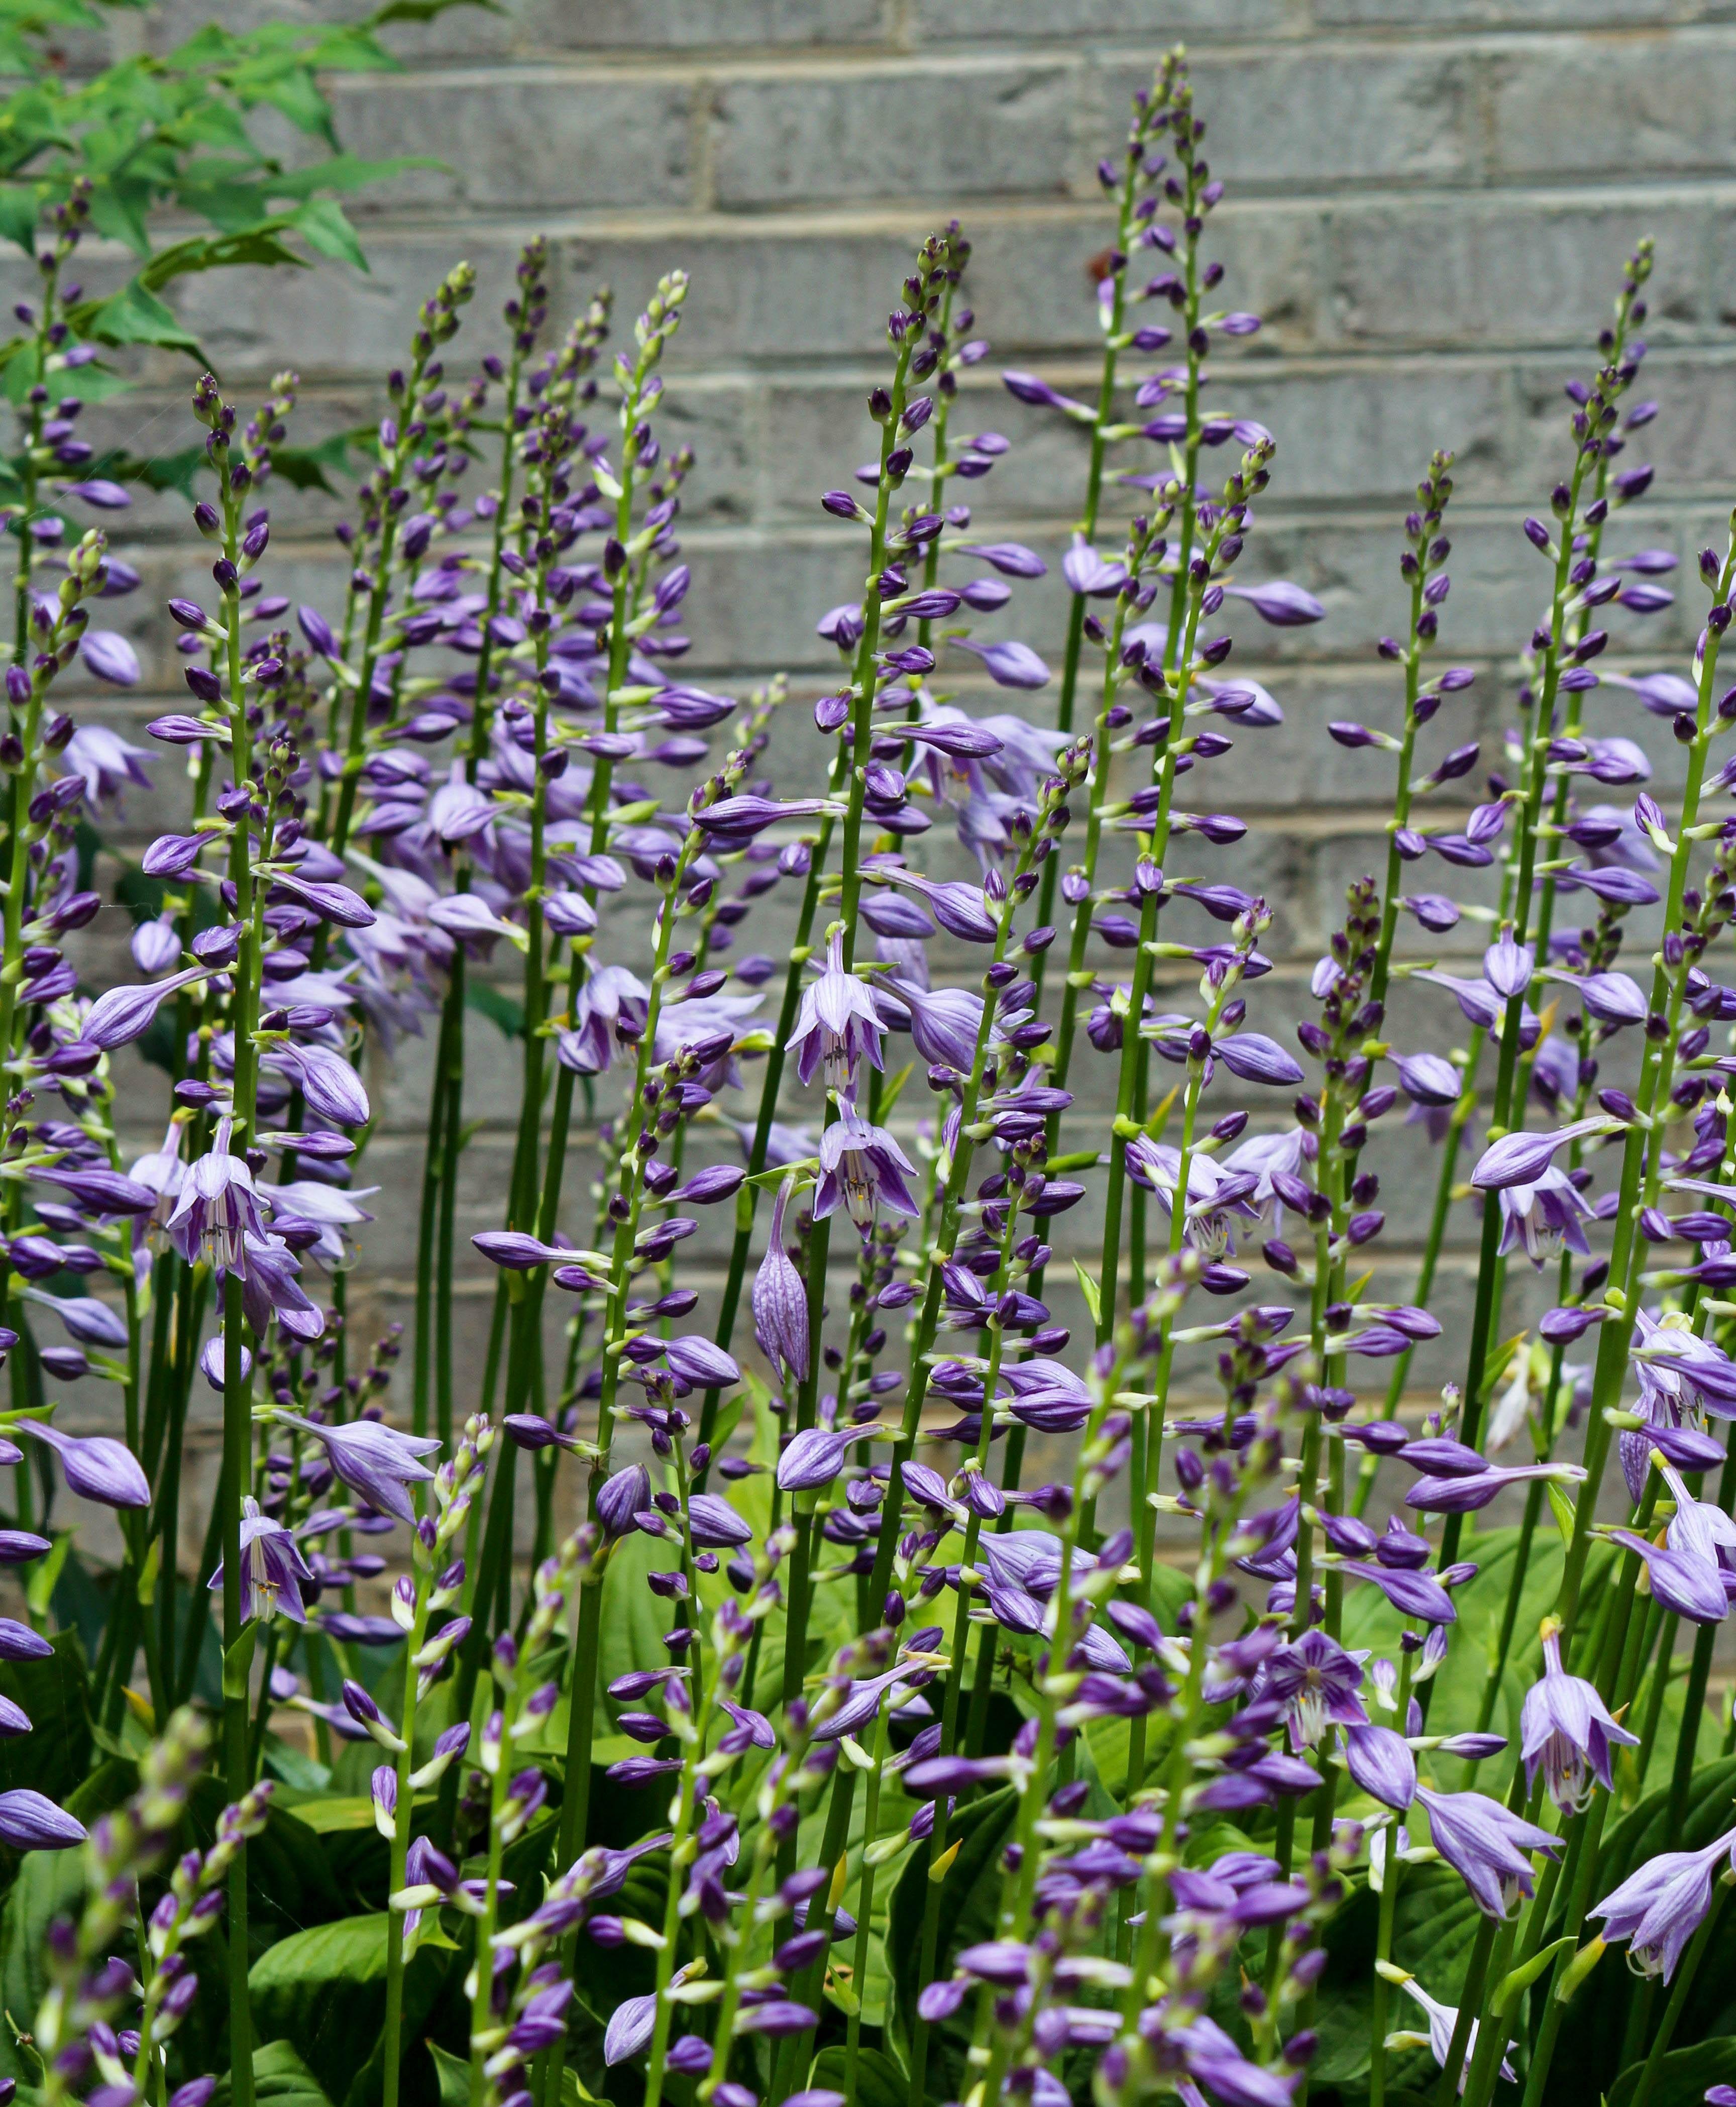 Free Images Bloom Herb Botany Blooming Garden Flora